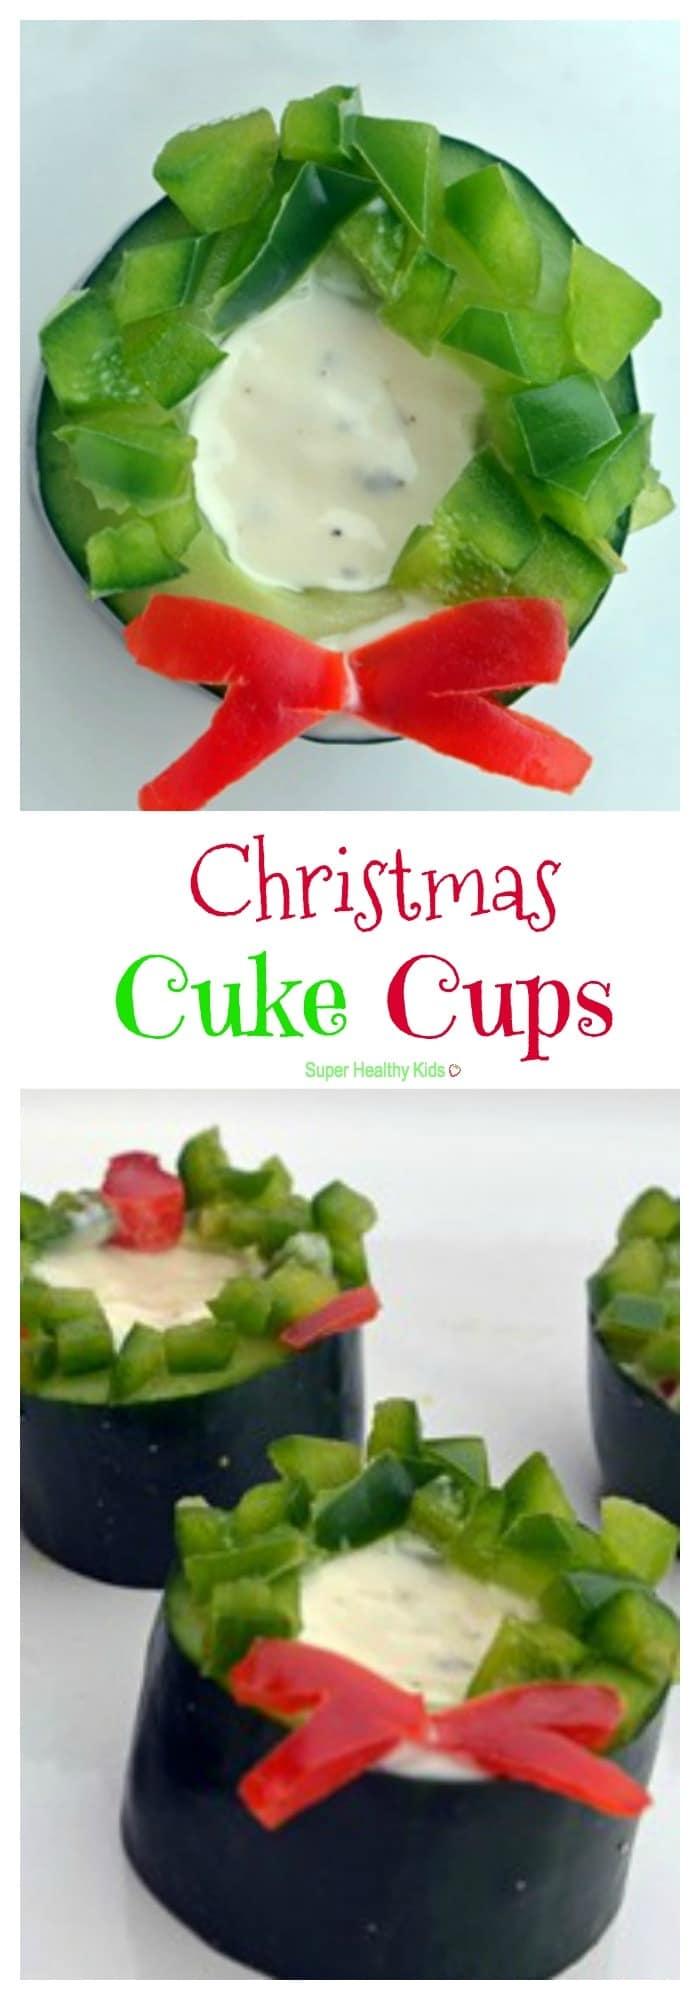 Christmas Cuke Cups. Veggies have never been so festive! https://www.superhealthykids.com/christmas-cuke-cups/